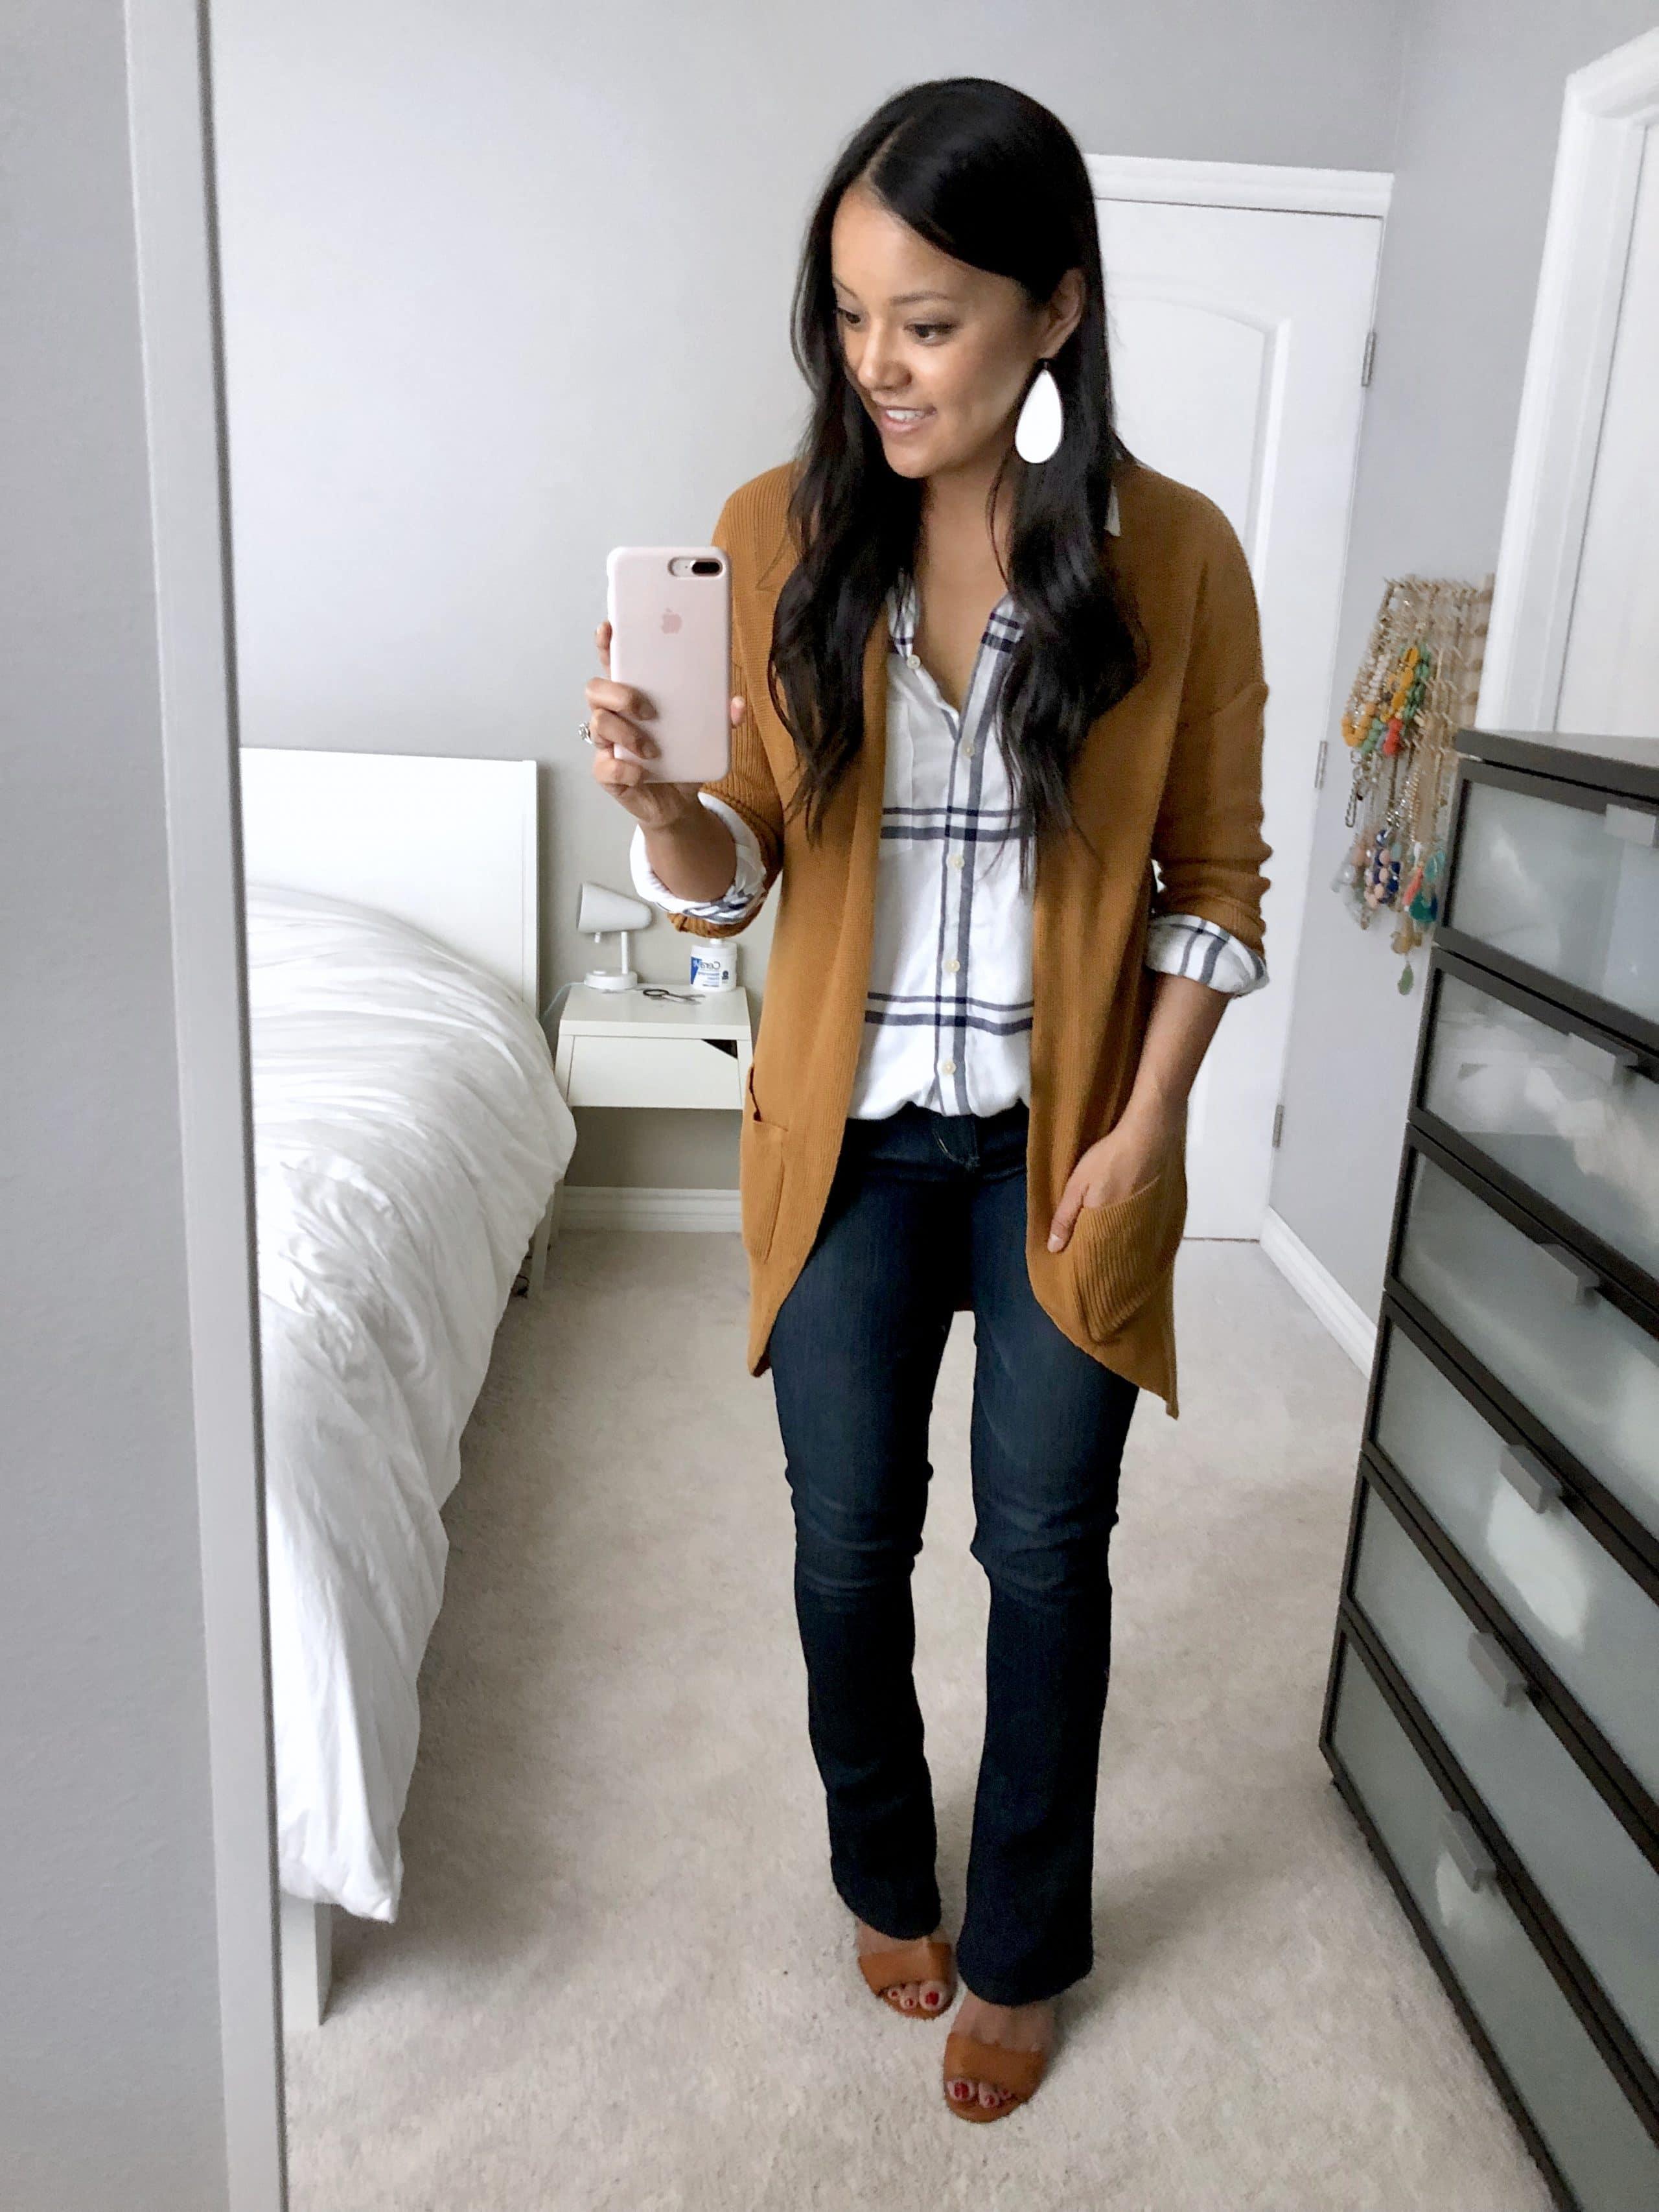 Bootcut jeans + Caramel Cardigan + Windowpane shirt + Heels